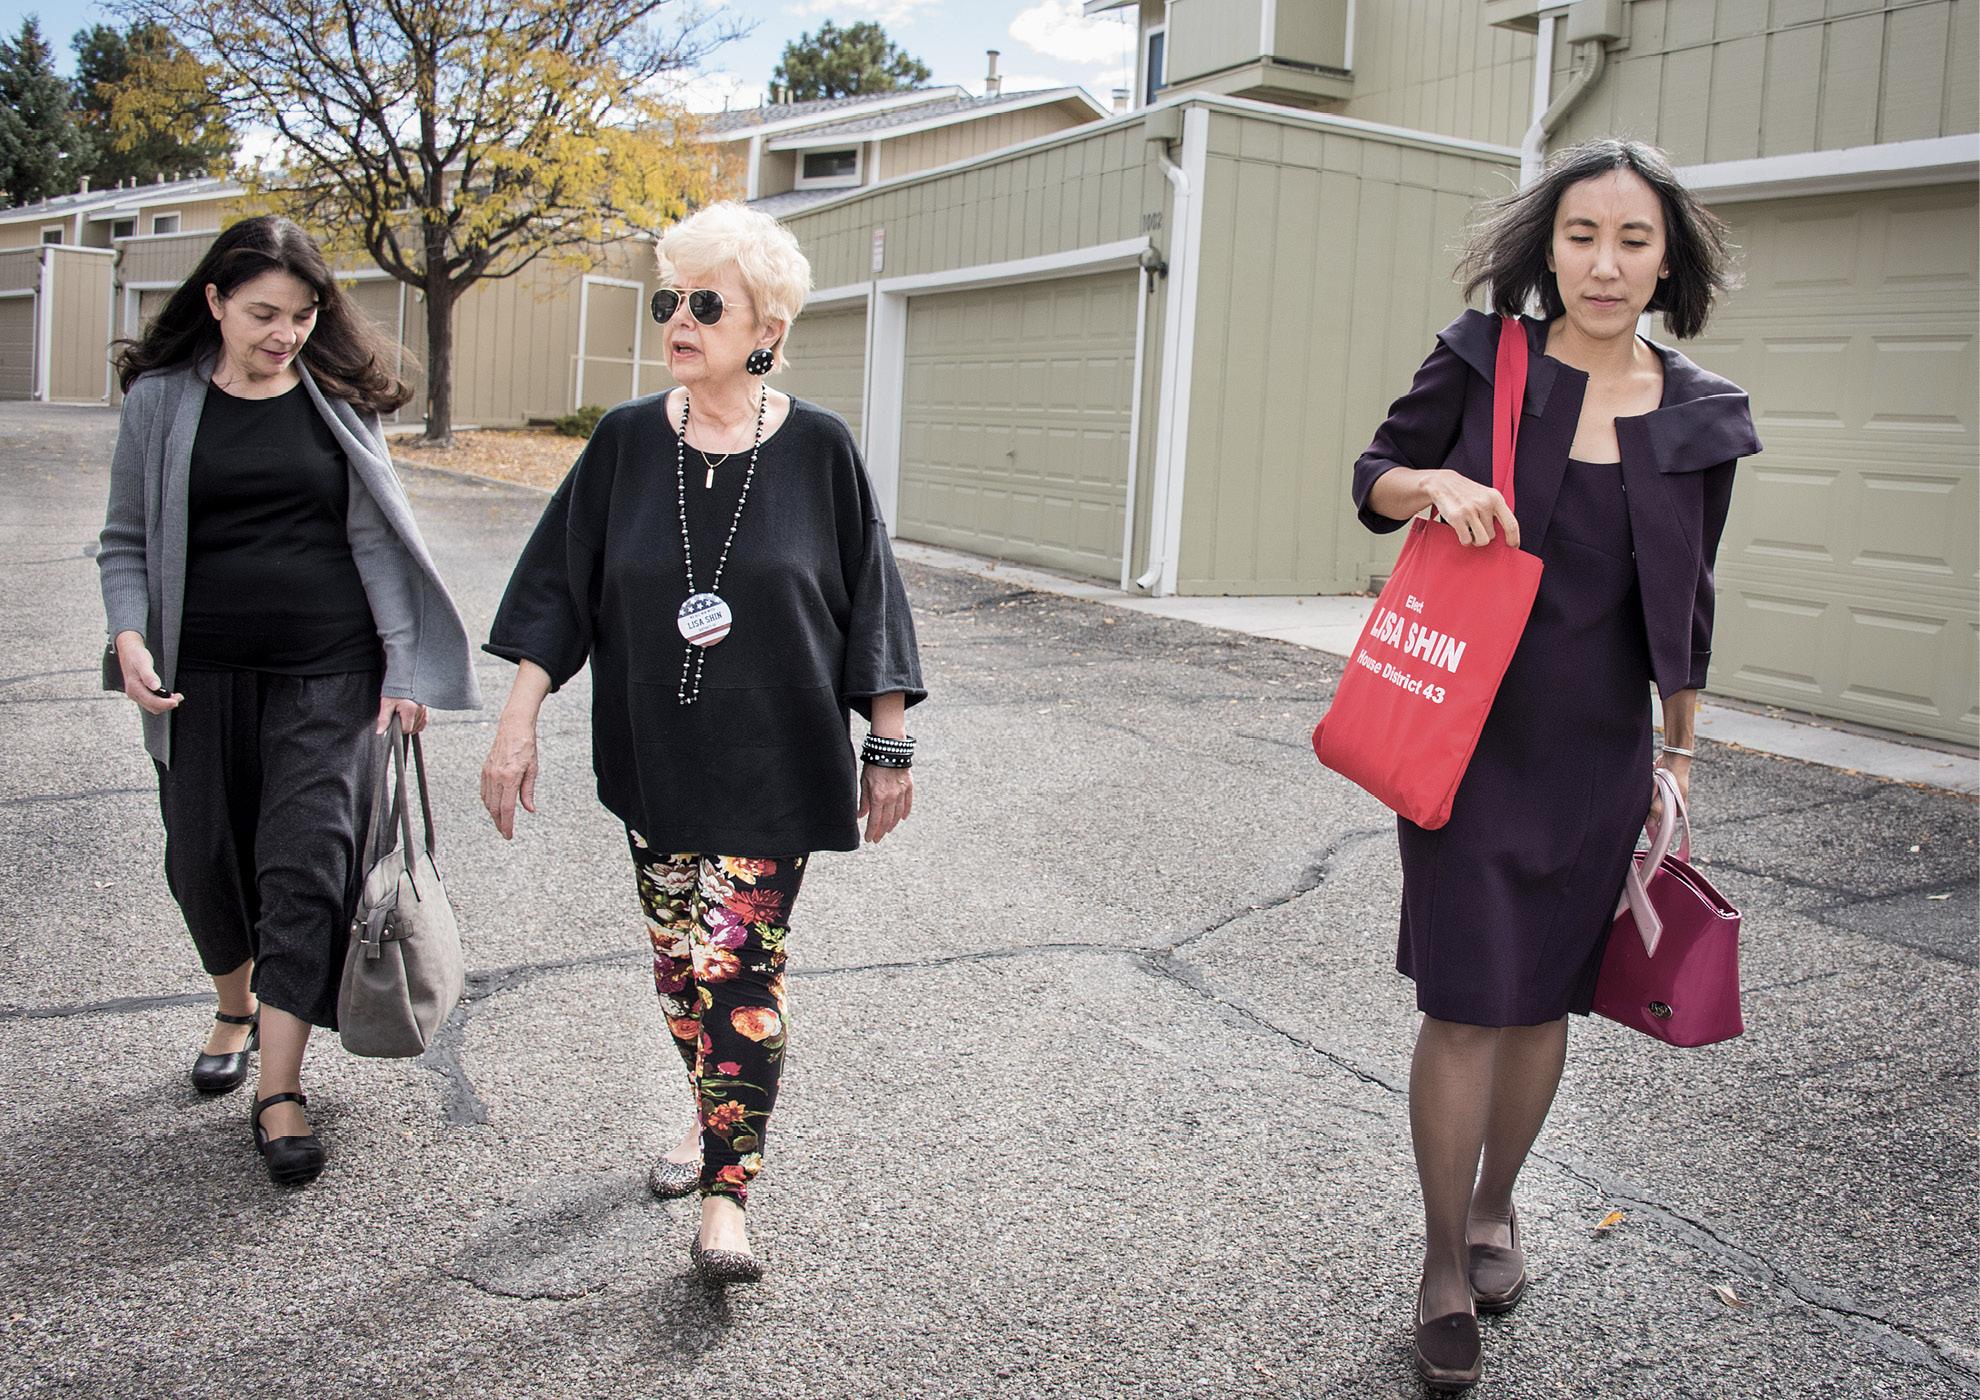 Shin walks with two women across a parking lot between meetings